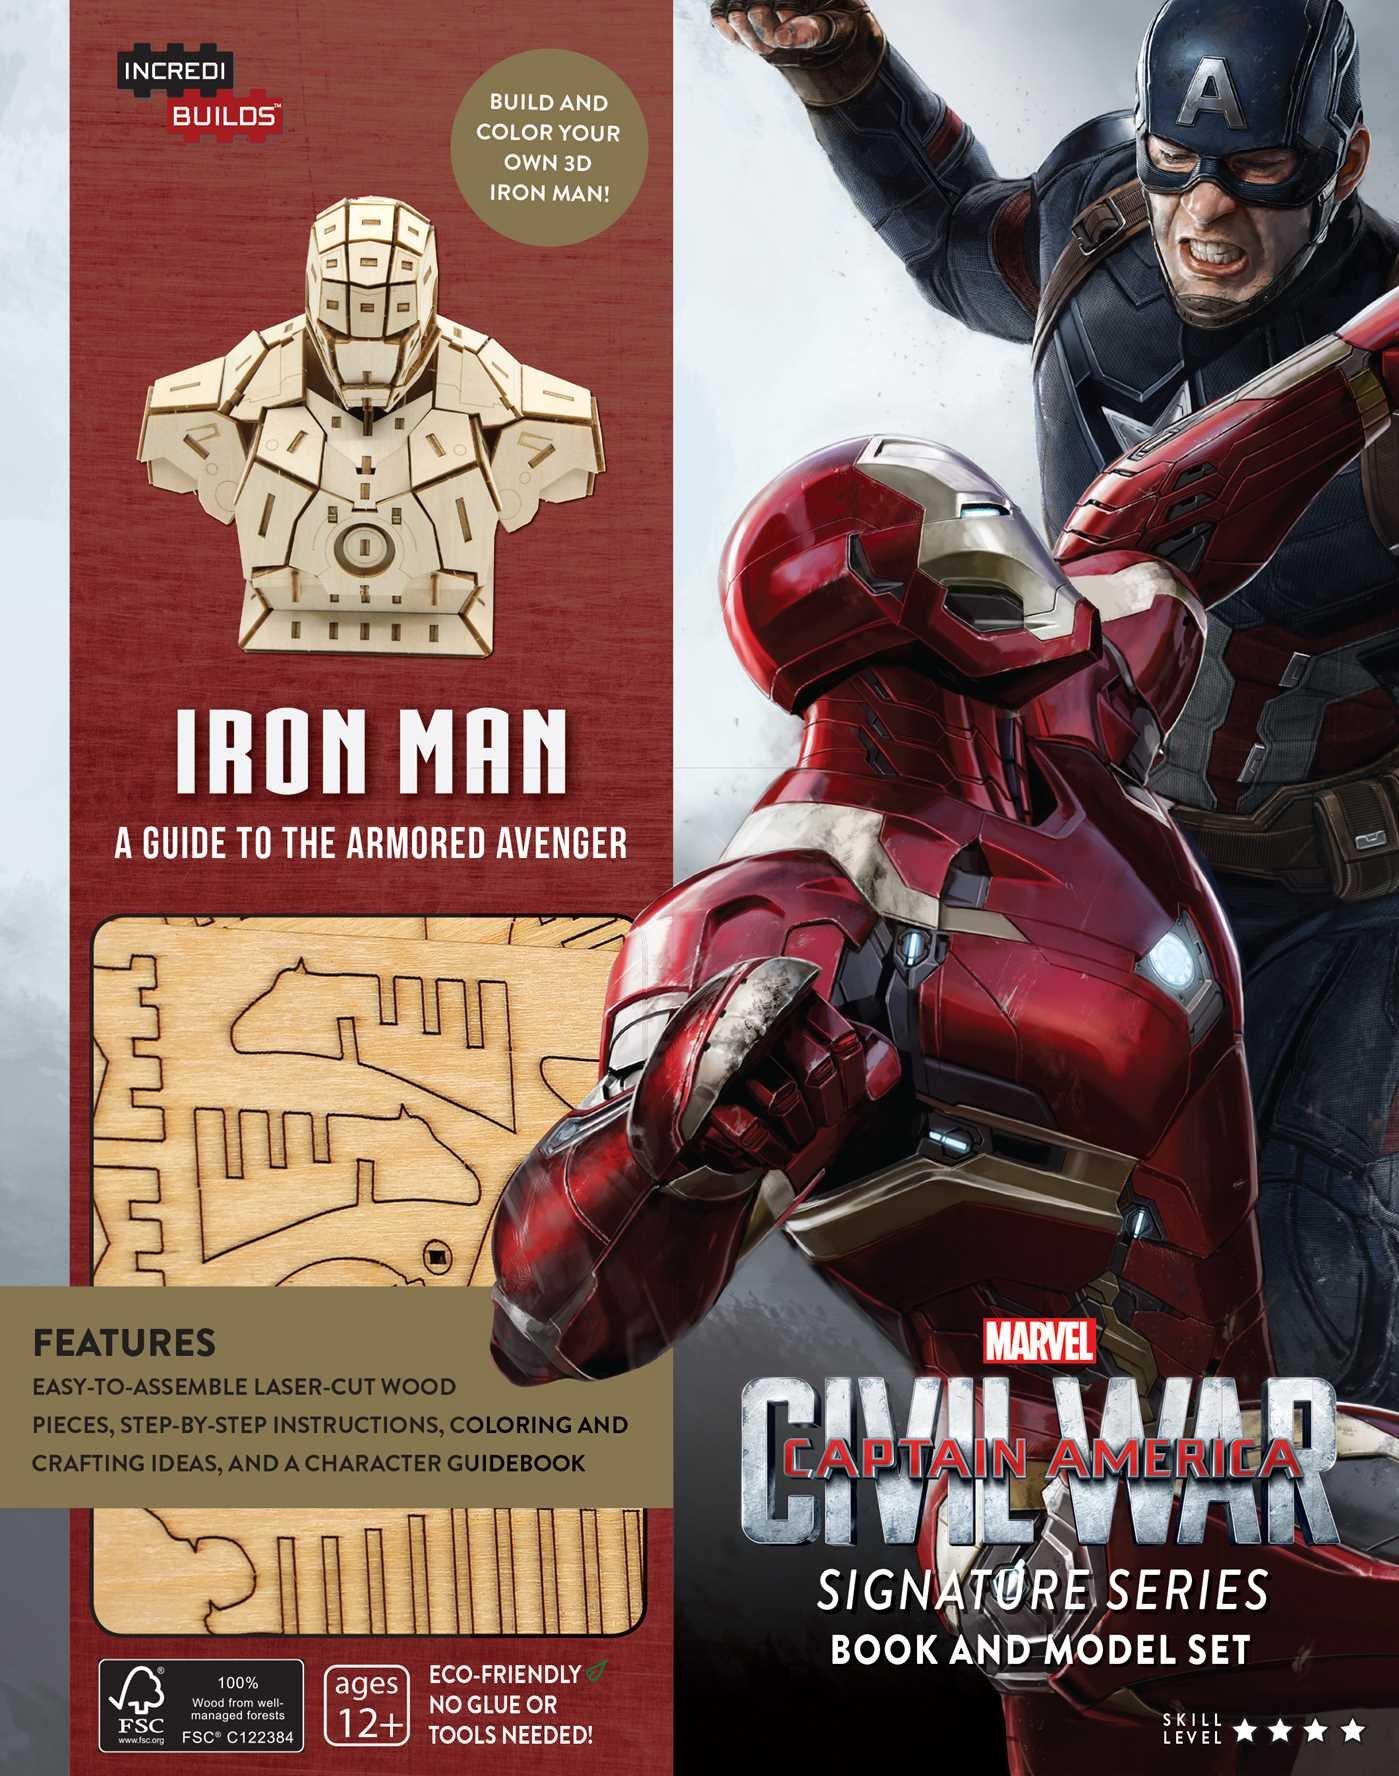 IncrediBuilds: Marvel's Captain America: Civil War: Iron Man Signature Series Book and Model Set pdf